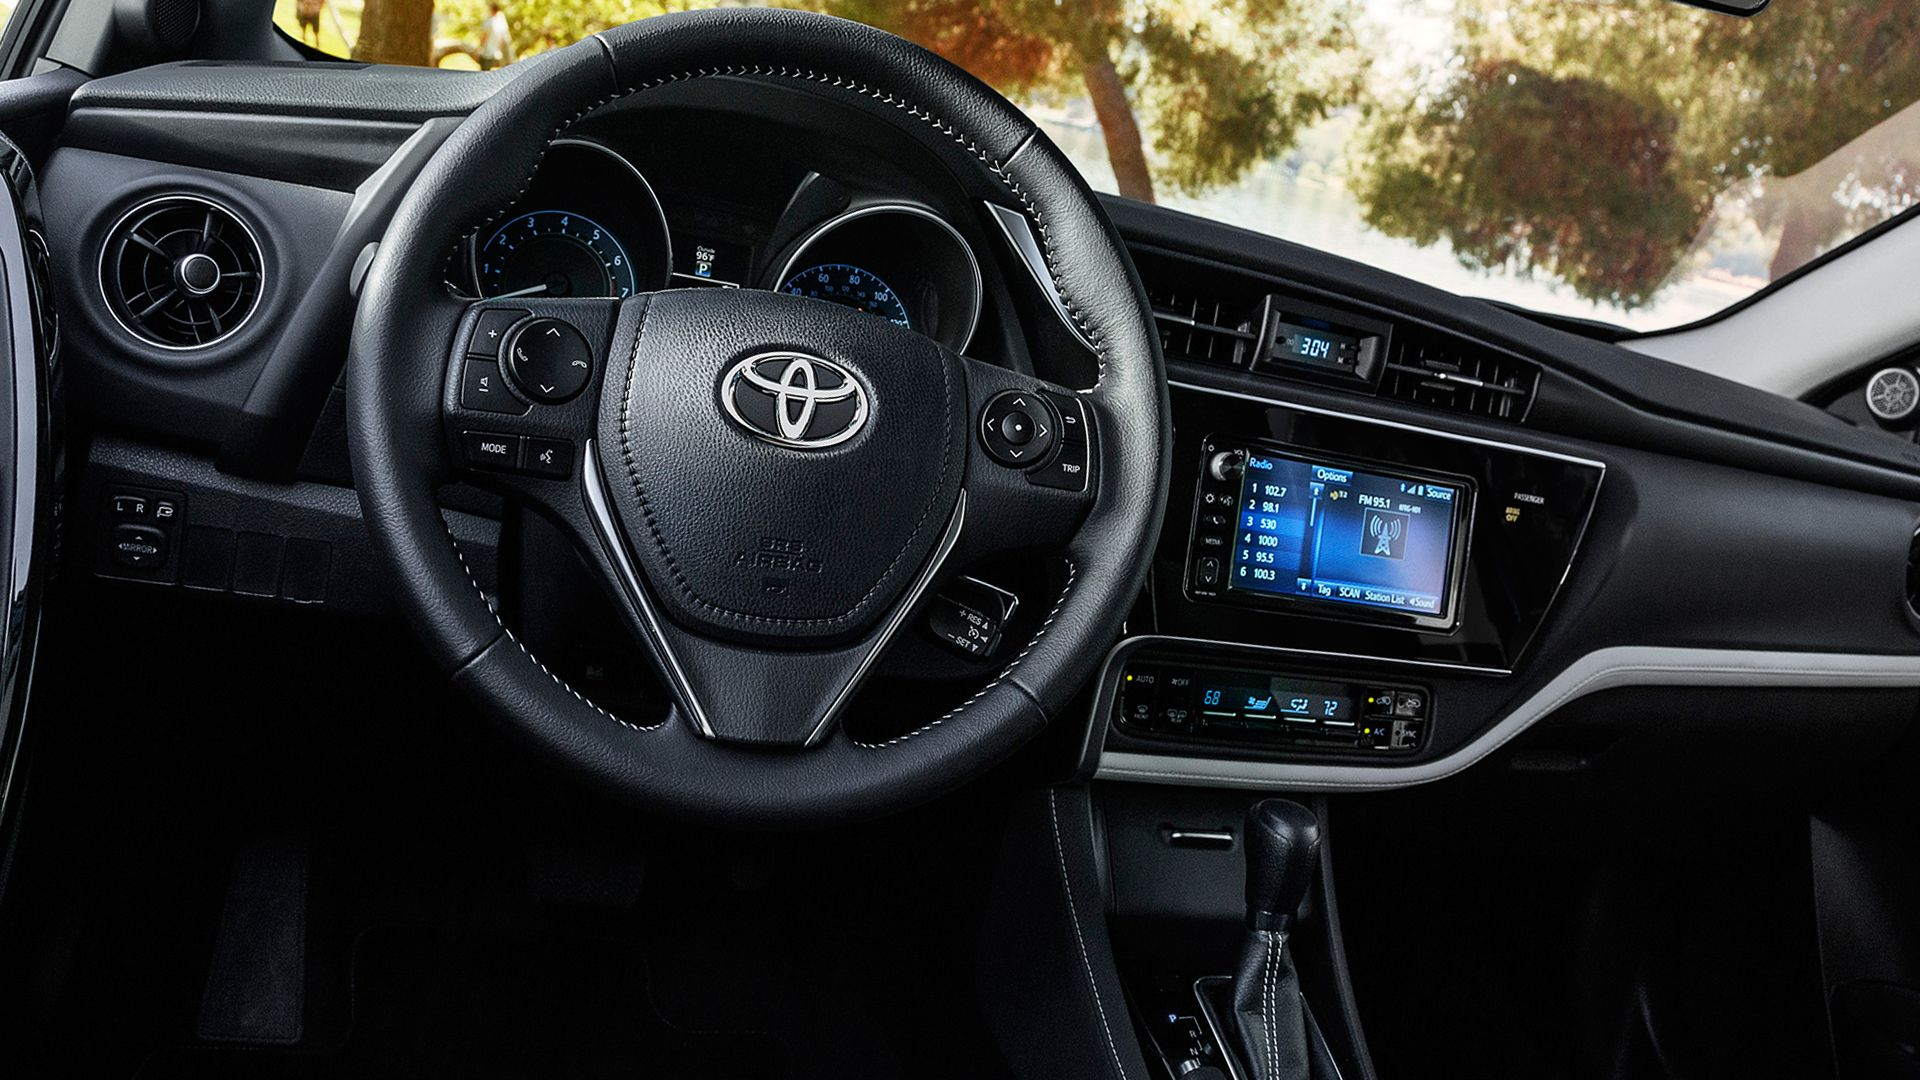 New 2019 Toyota Corolla Interior Design Toyota Car Prices List